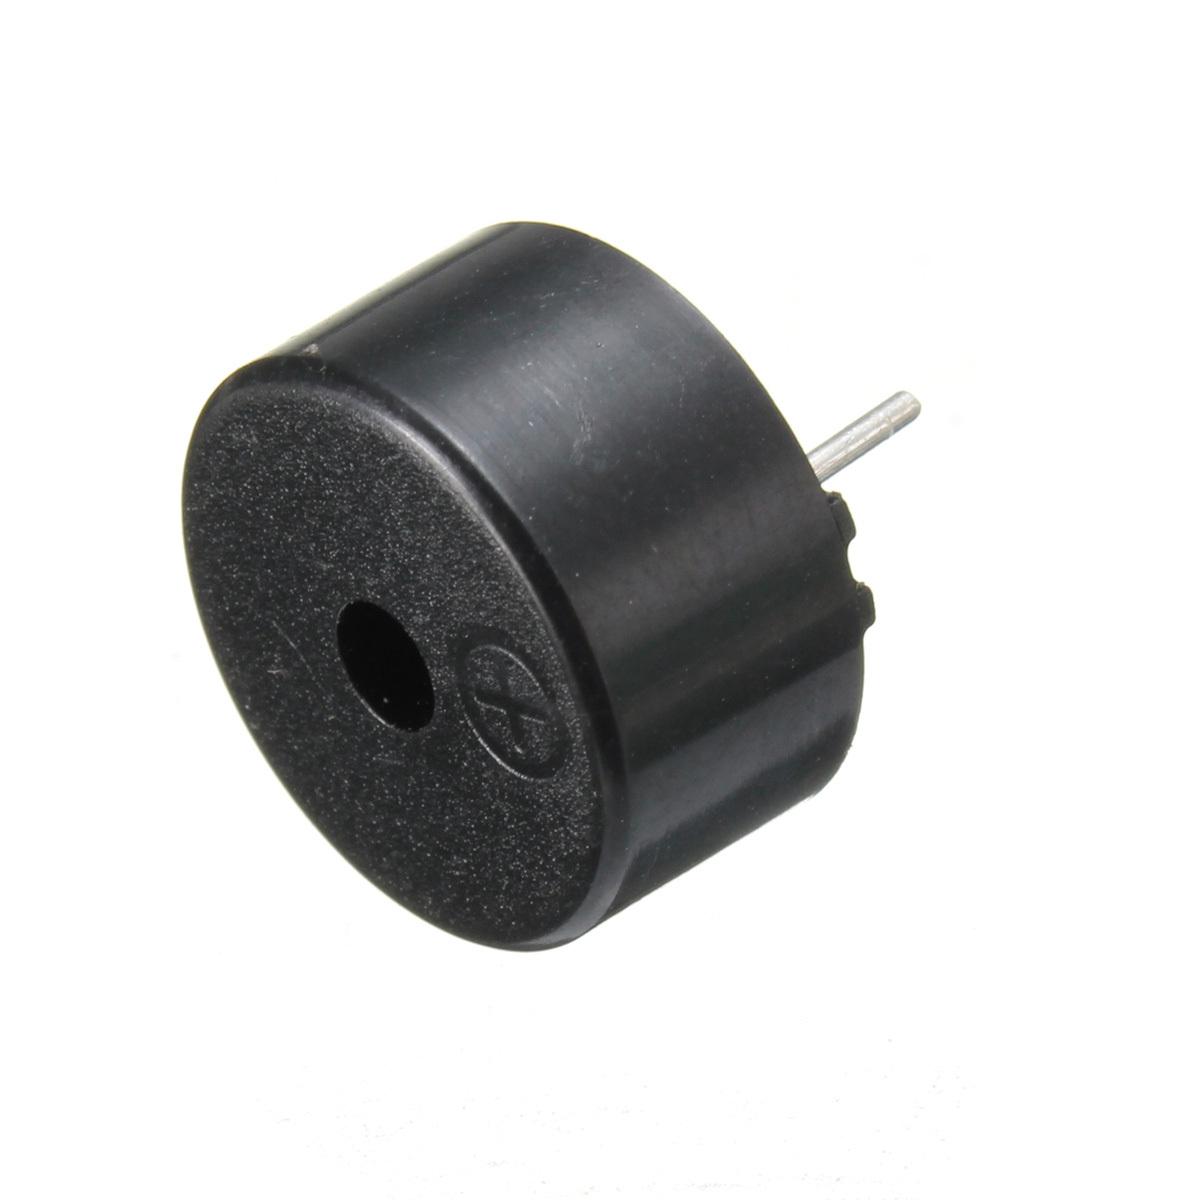 2017 Hot Sale Black Plastic 14 x 7mm 2 Pins Passive Piezo Buzzer AC1-3V Piezo Transducer with Flying Lead Acoustic Components